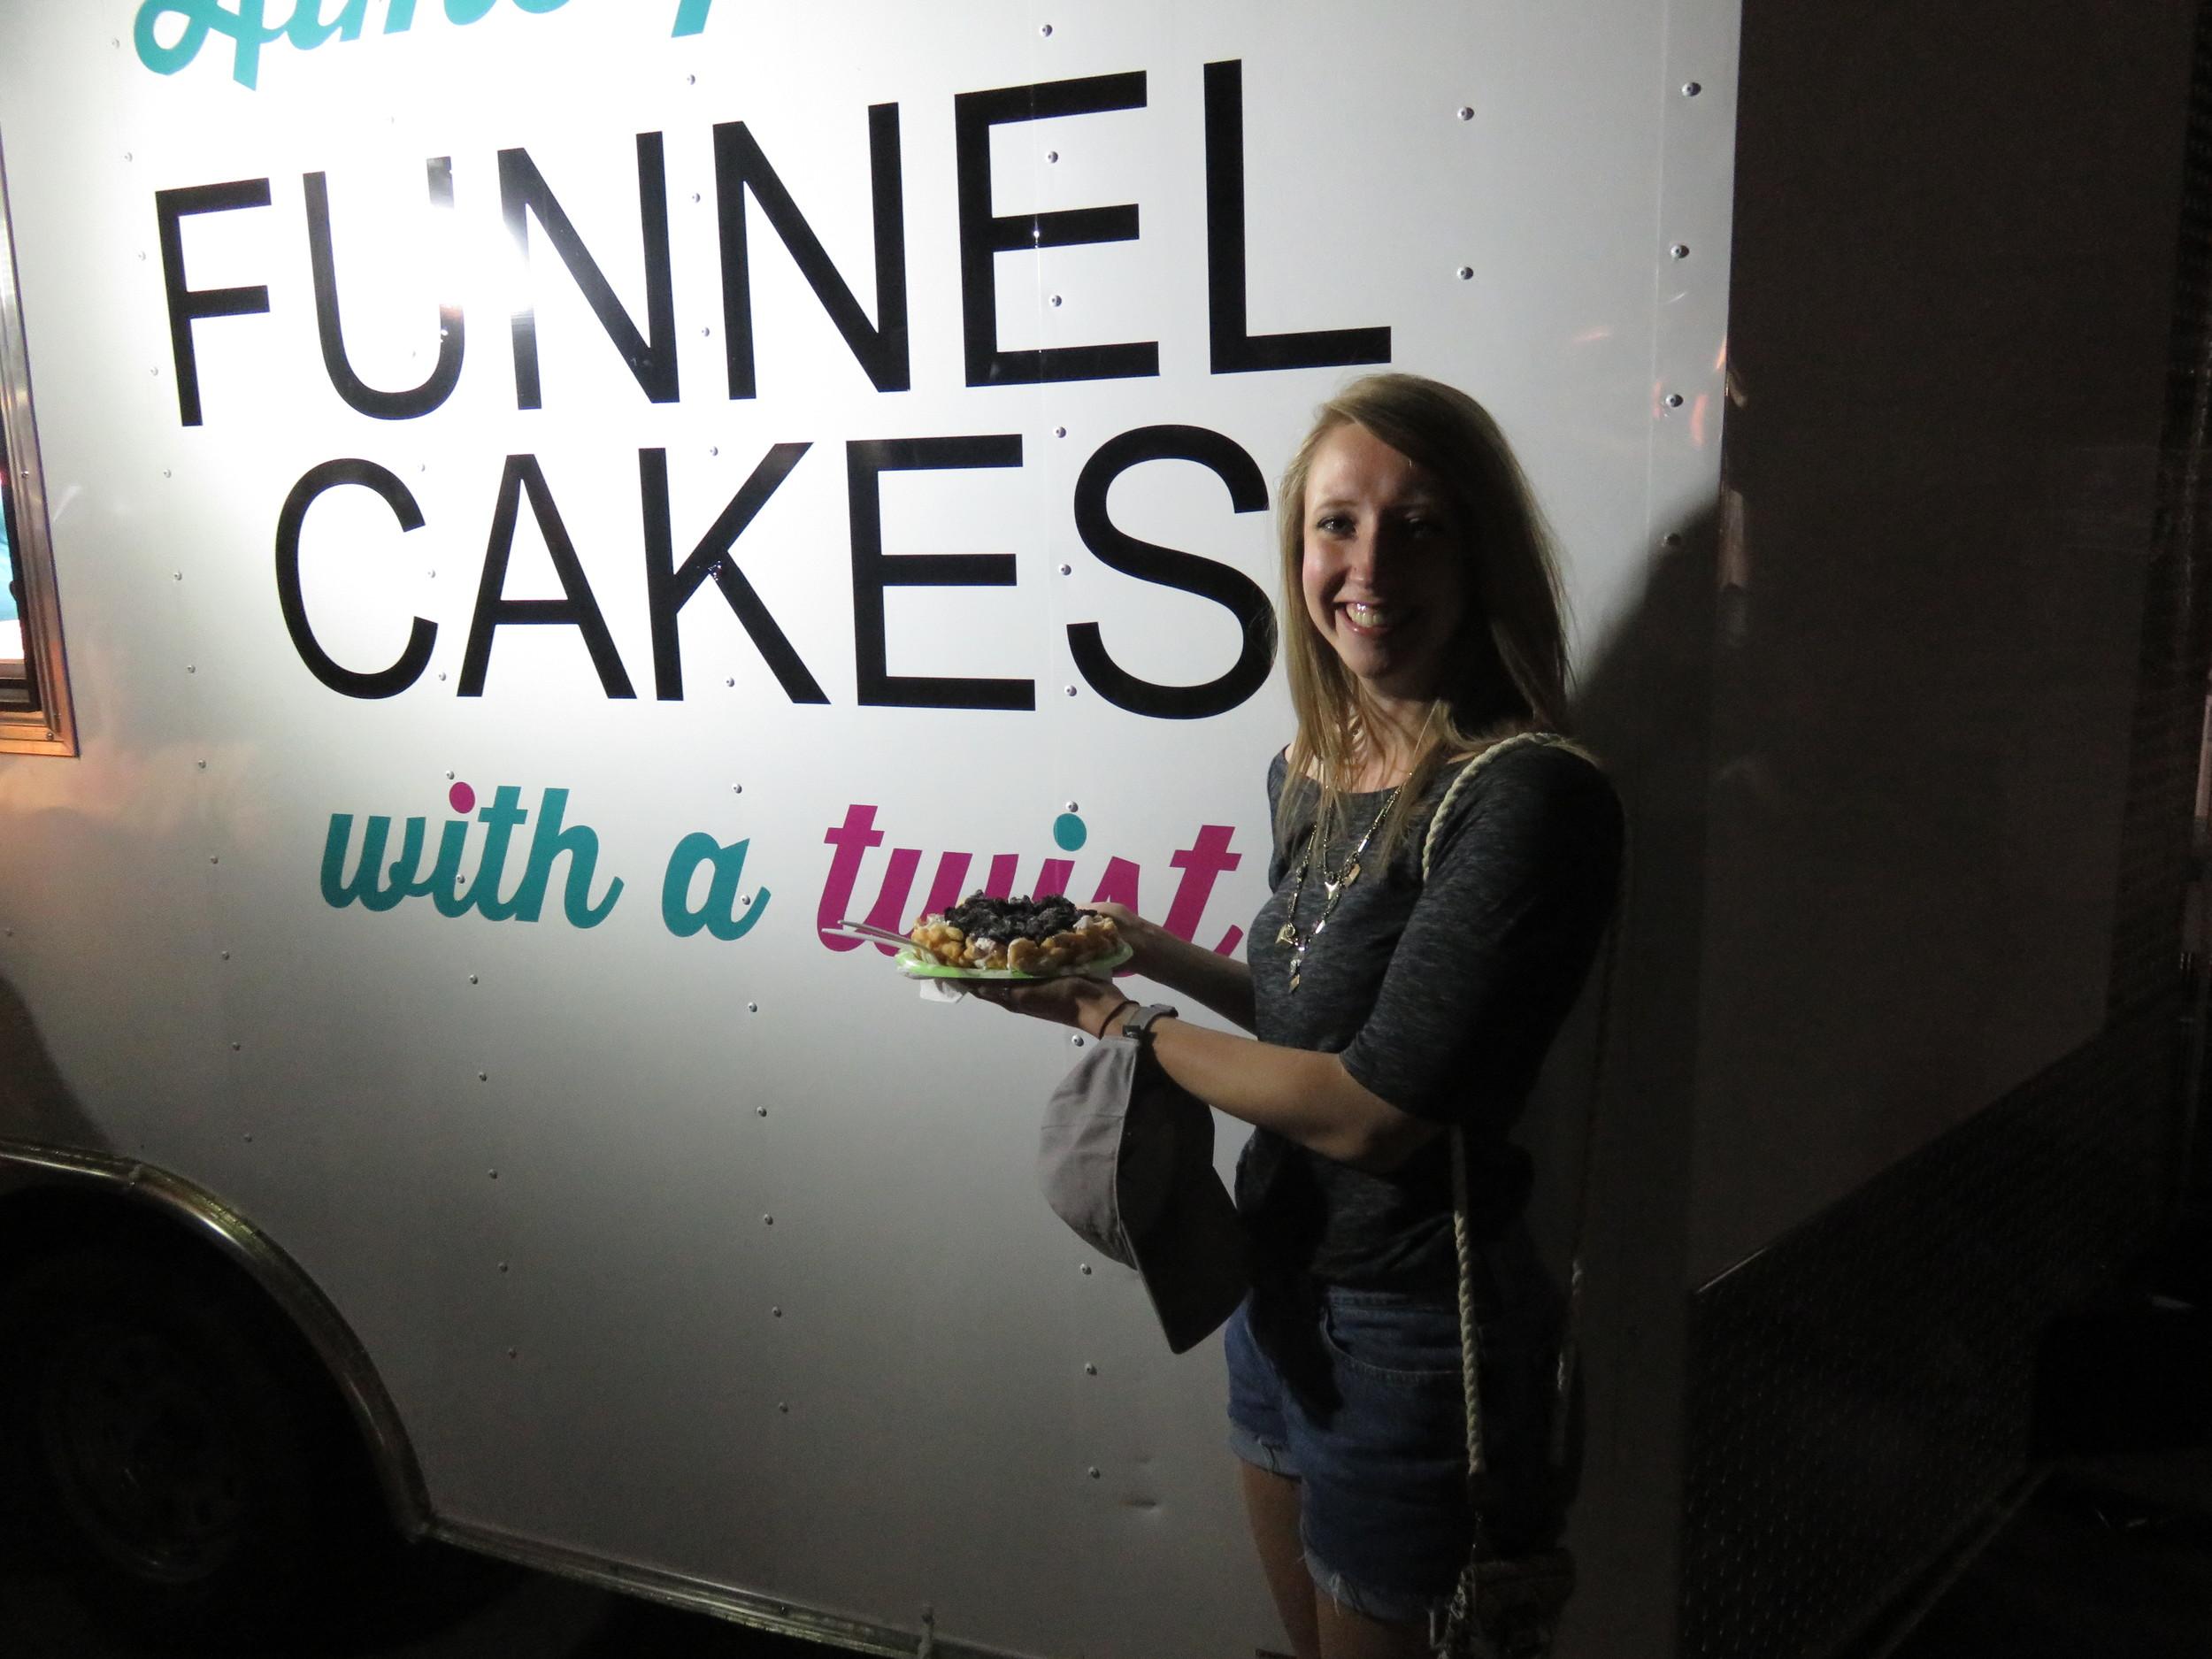 Elizabeth and her funnel cake!